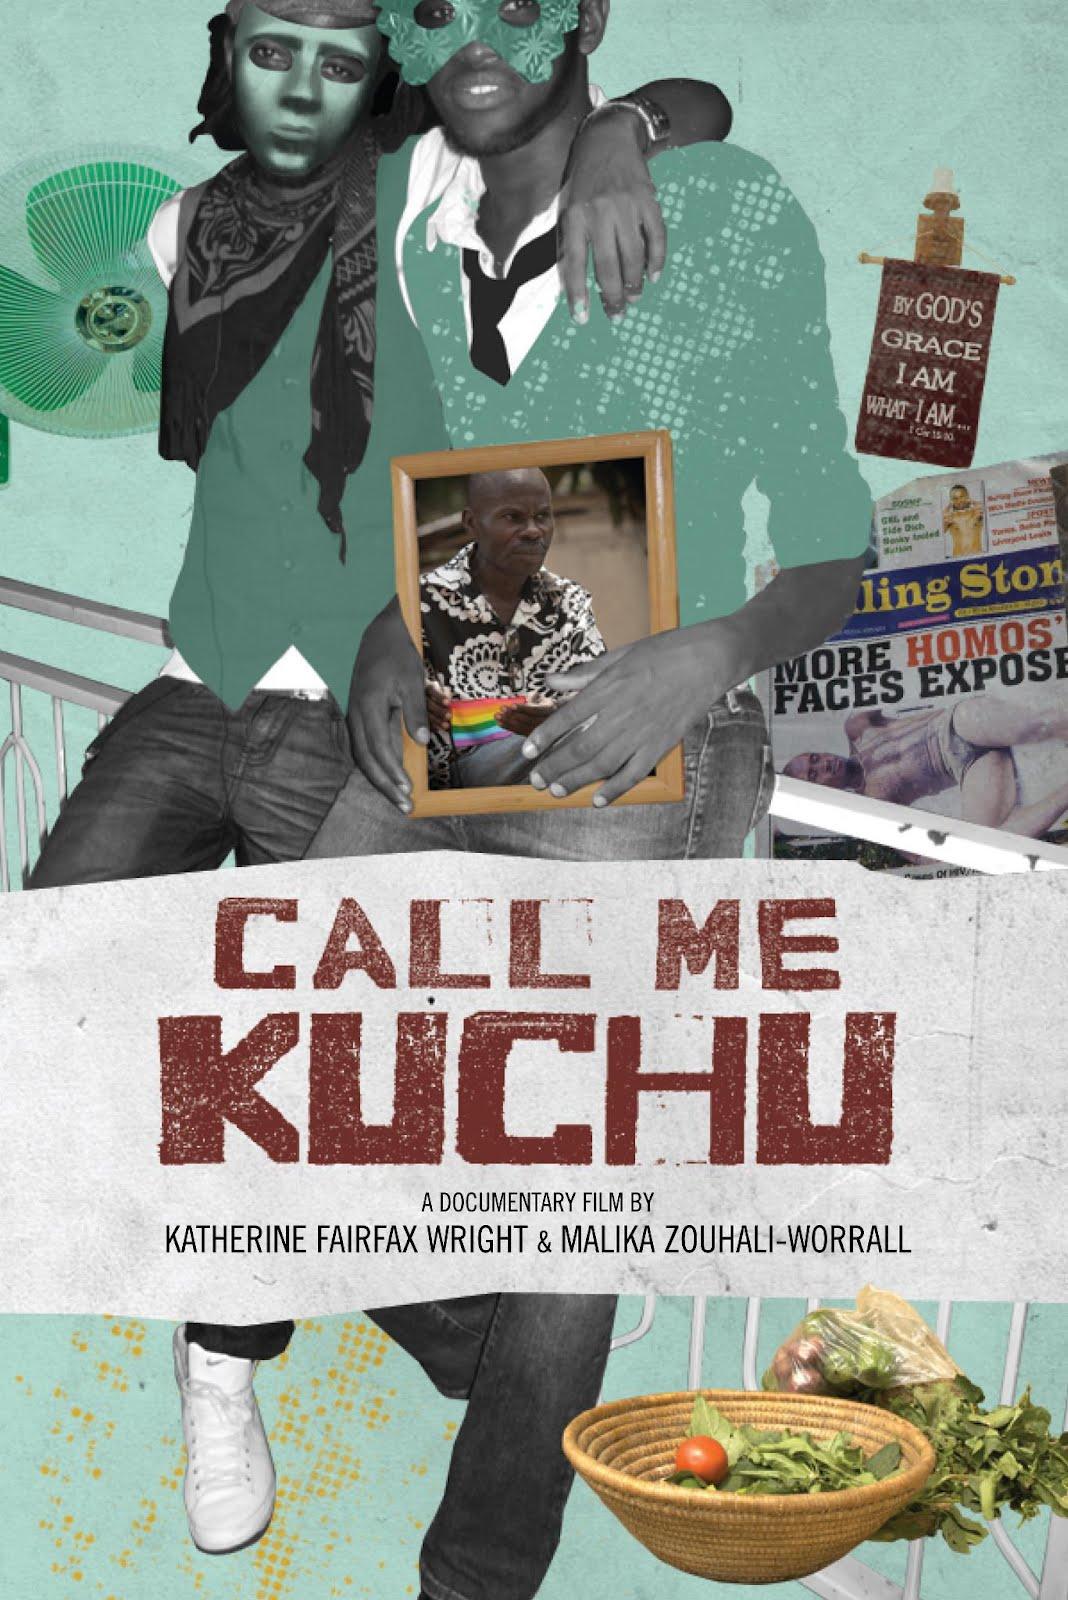 http://descubrepelis.blogspot.com/2014/02/kuchu.html